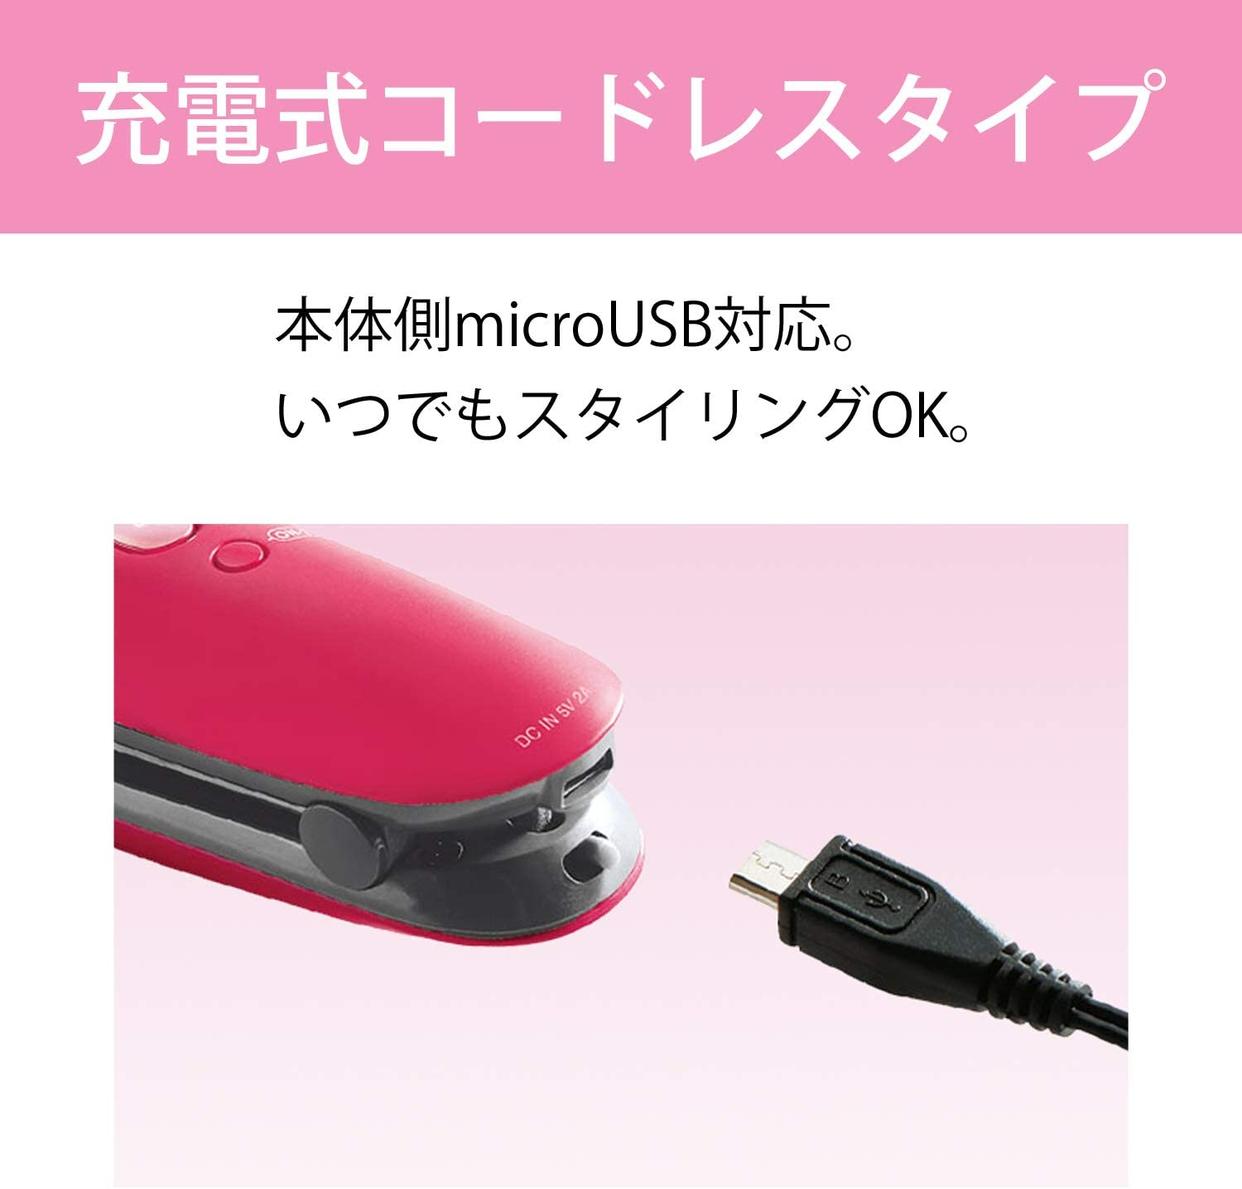 KOIZUMI(コイズミ) コードレスストレートアイロン KHS-8620の商品画像2